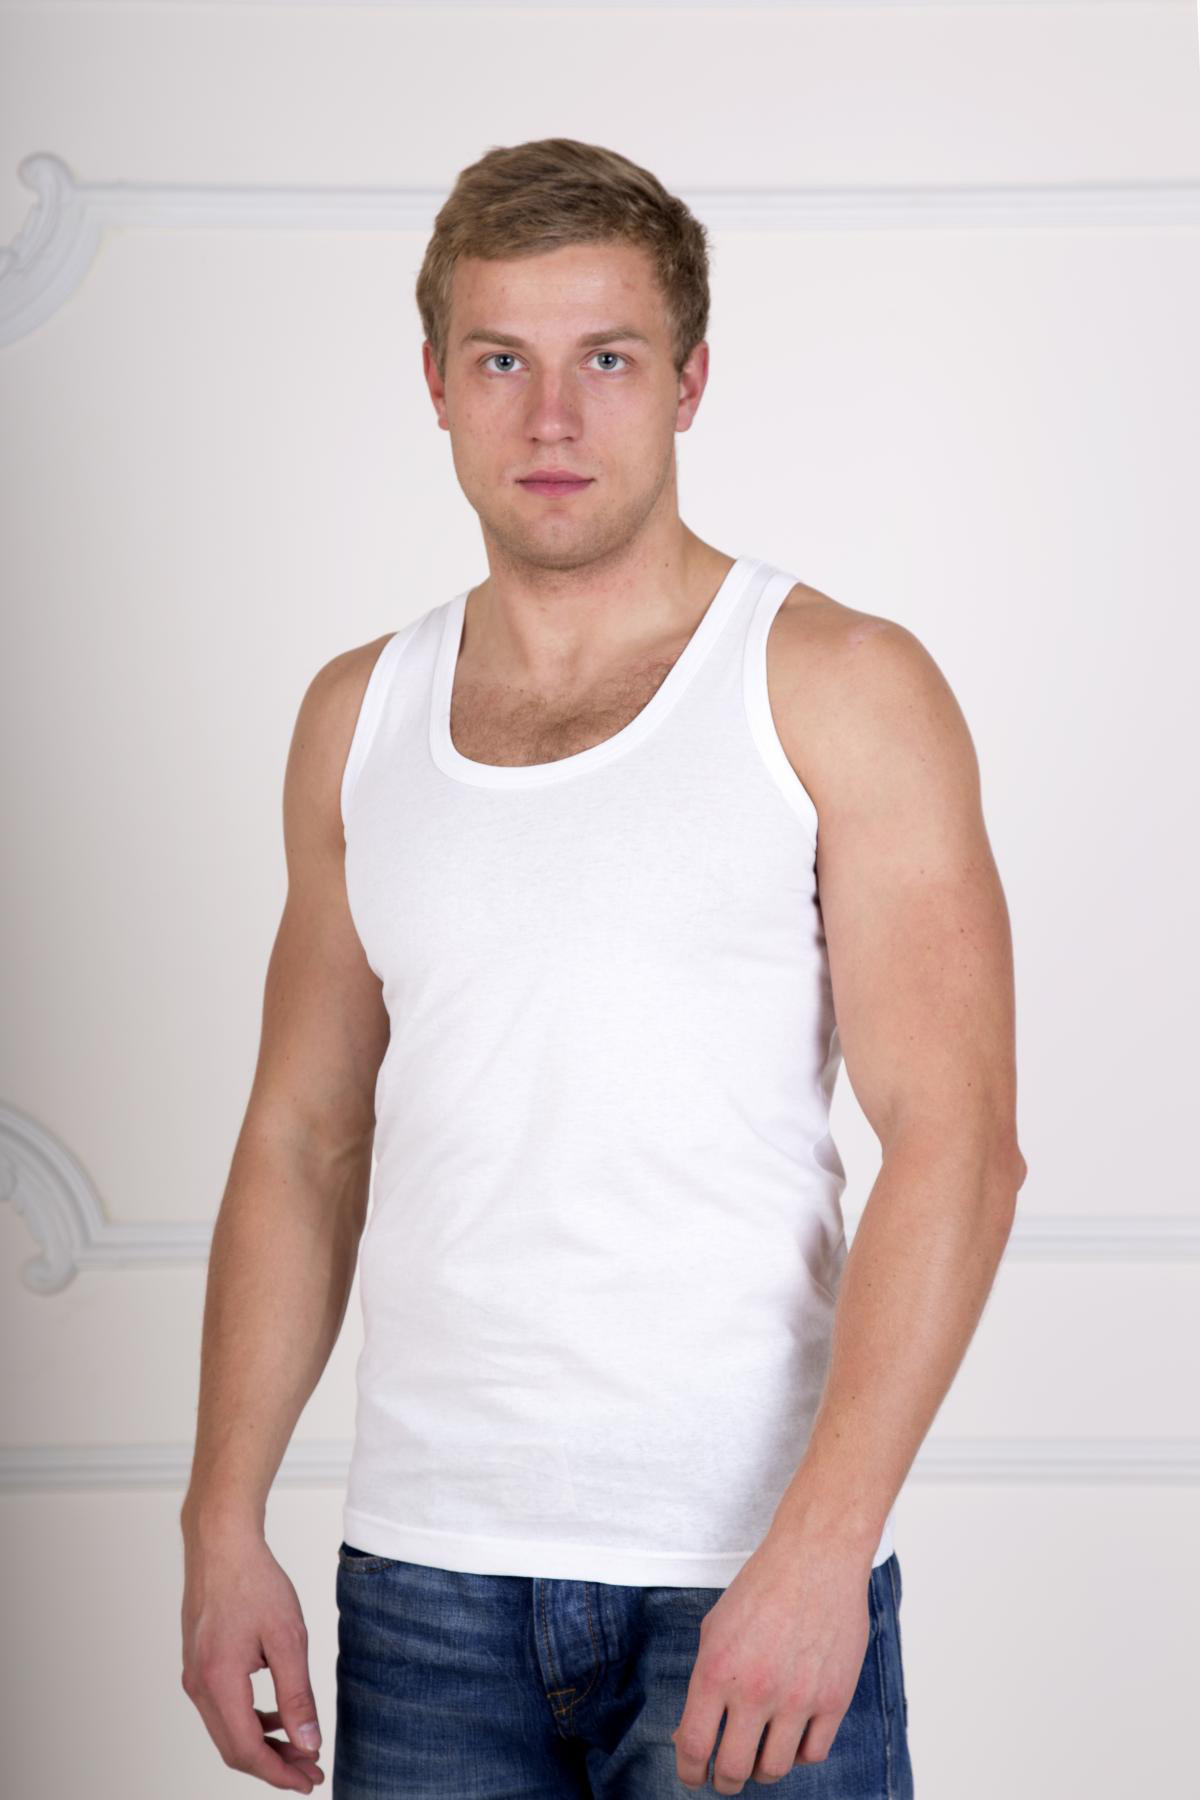 Муж. майка Верн Белый р. 58Майки и футболки<br>Факт. ОГ: 108 см <br>Факт. ОТ: 106 см <br>Факт. ОБ: 108 см <br>Длина по спинке: 79 см<br><br>Тип: Муж. майка<br>Размер: 58<br>Материал: Кулирка